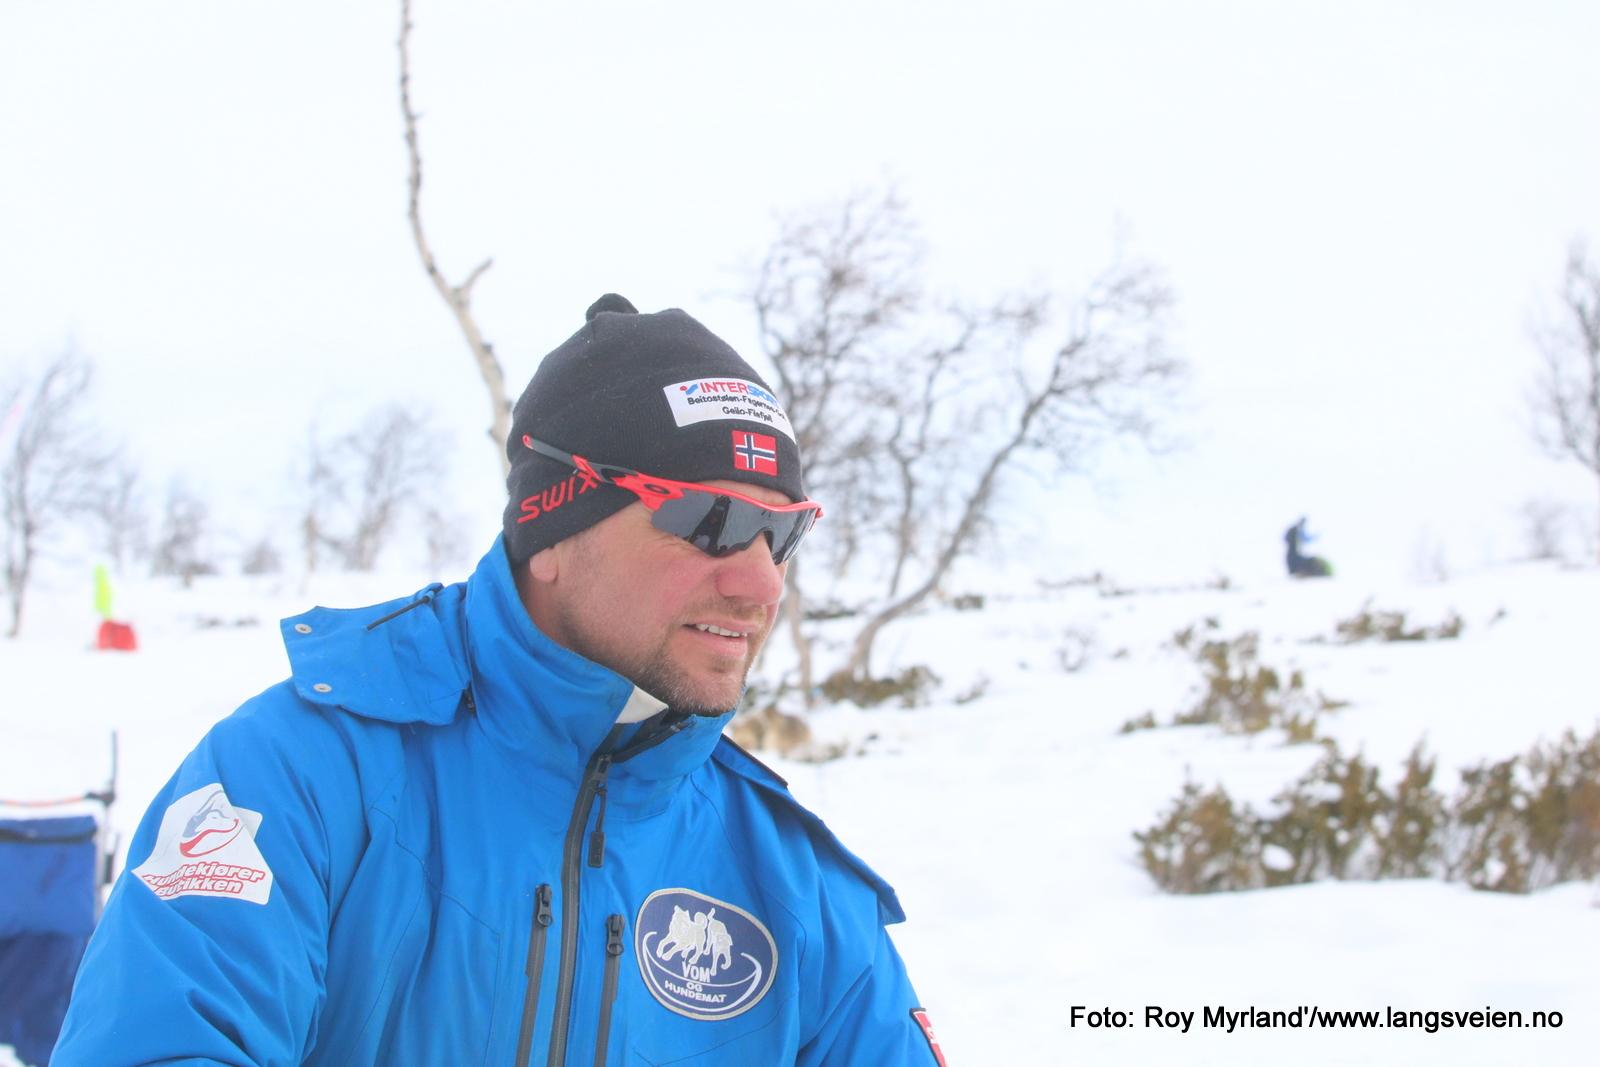 Roy Storli Vom og hundemat hundekjører paragliderpilot ridderuka foto roy myrland